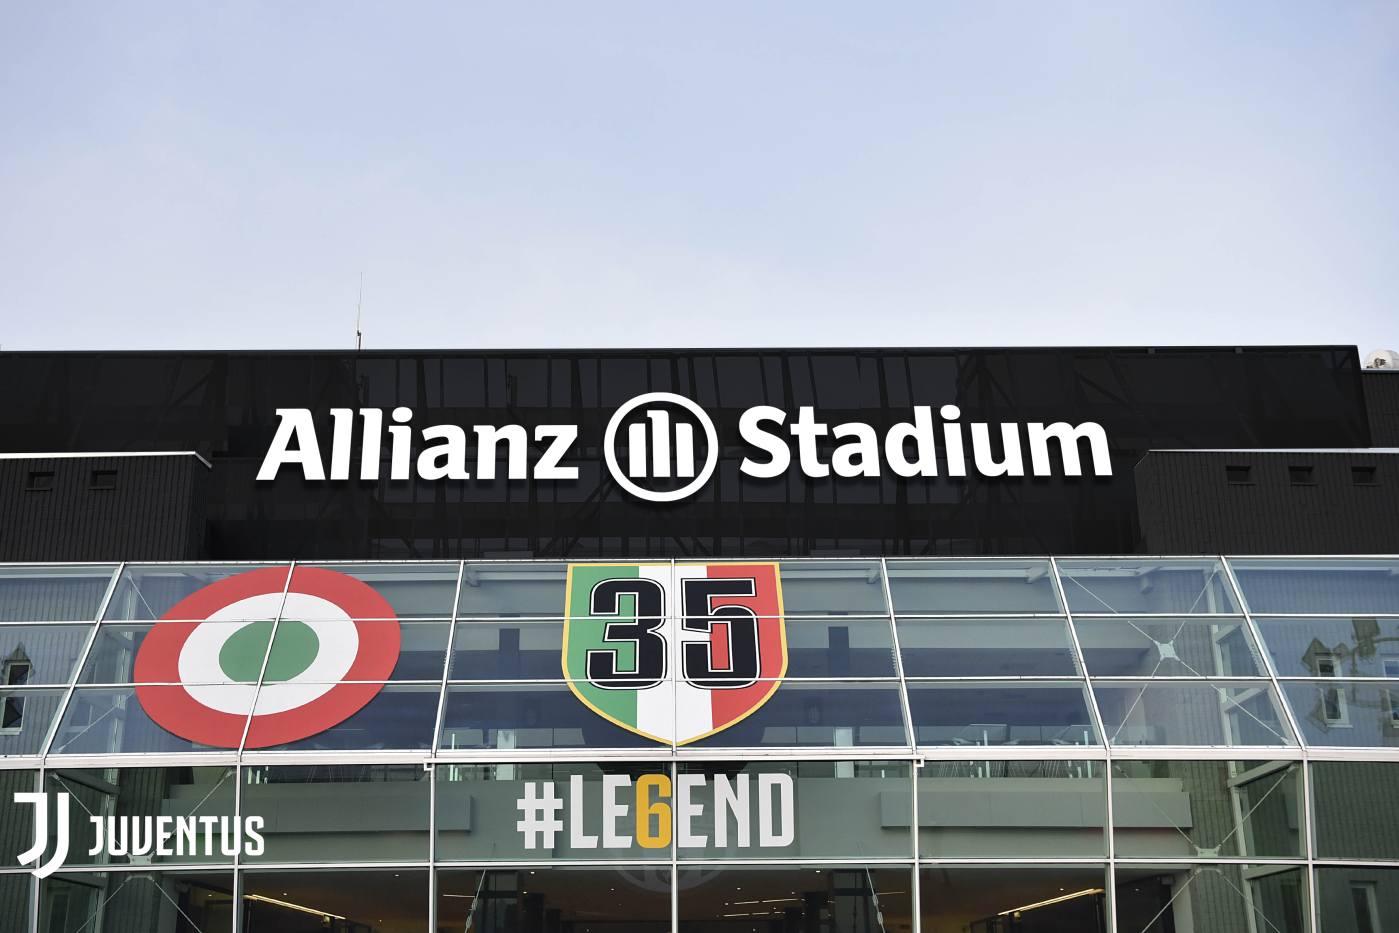 Bayern Munich Juventus More Here Are All 8 Allianz Stadiums Worldwide Footy Headlines